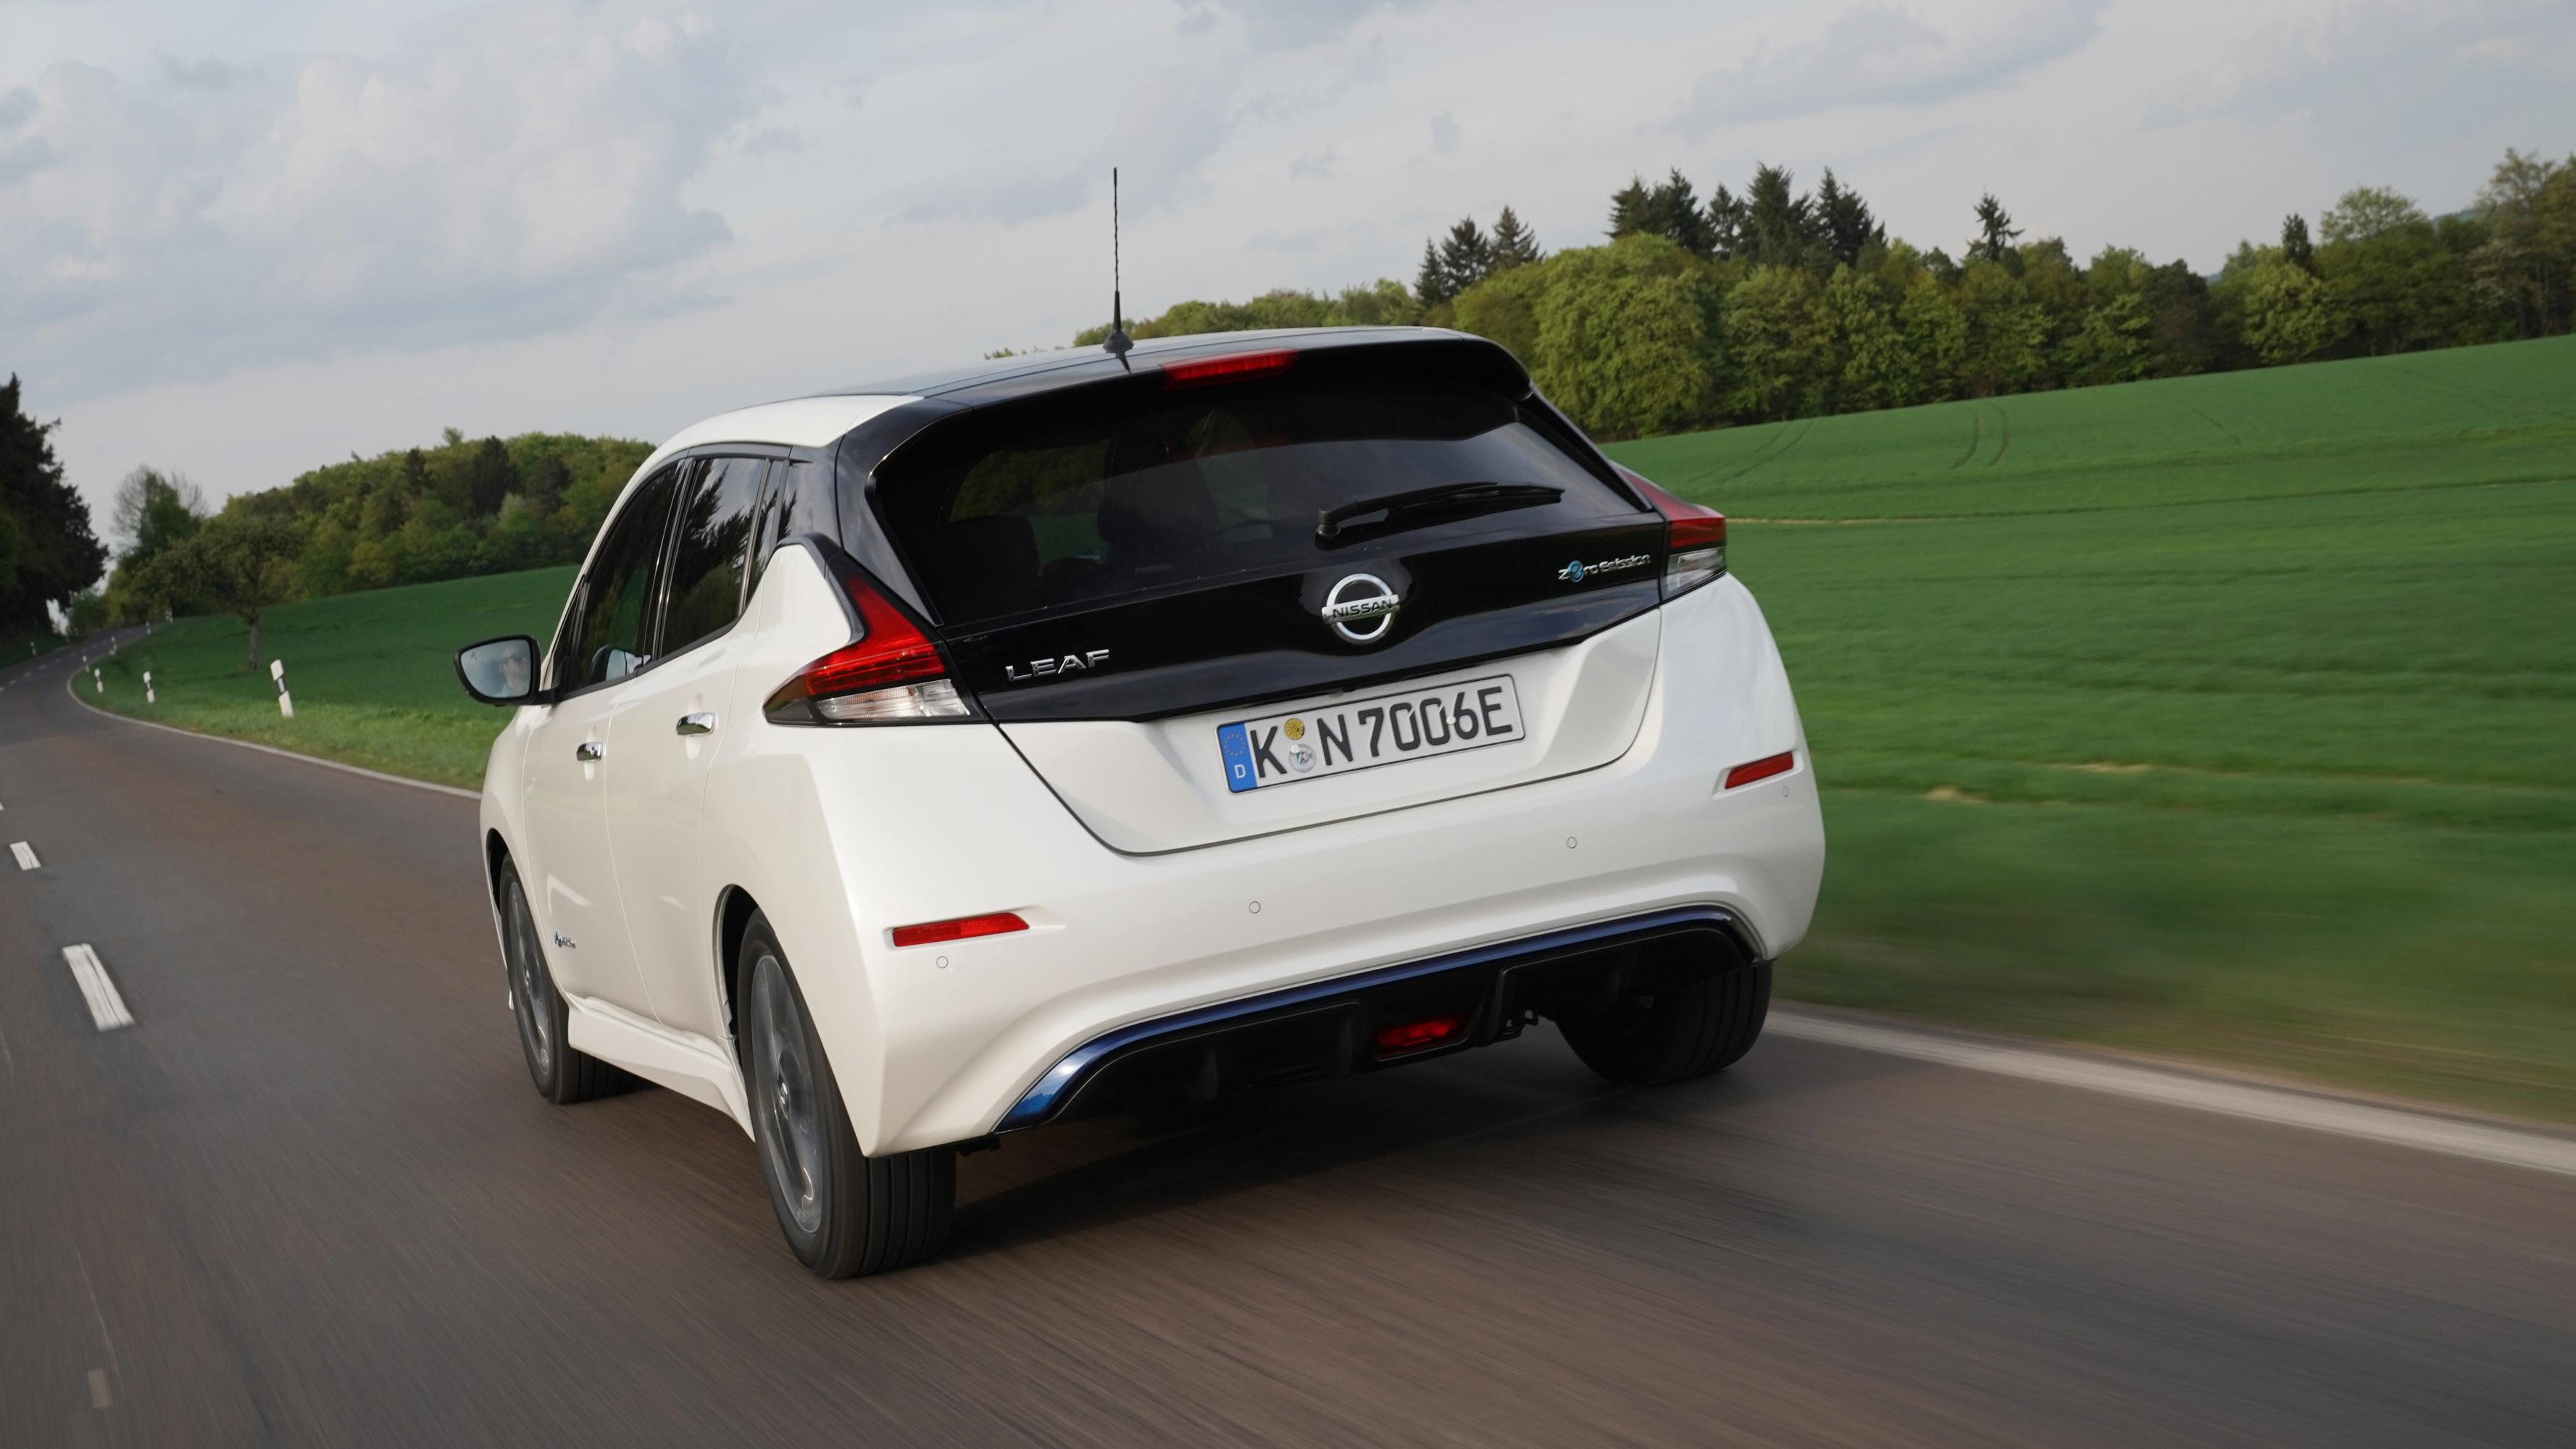 nissan leaf 2018 - fahrspaß dank e-pedal | elektroauto blog